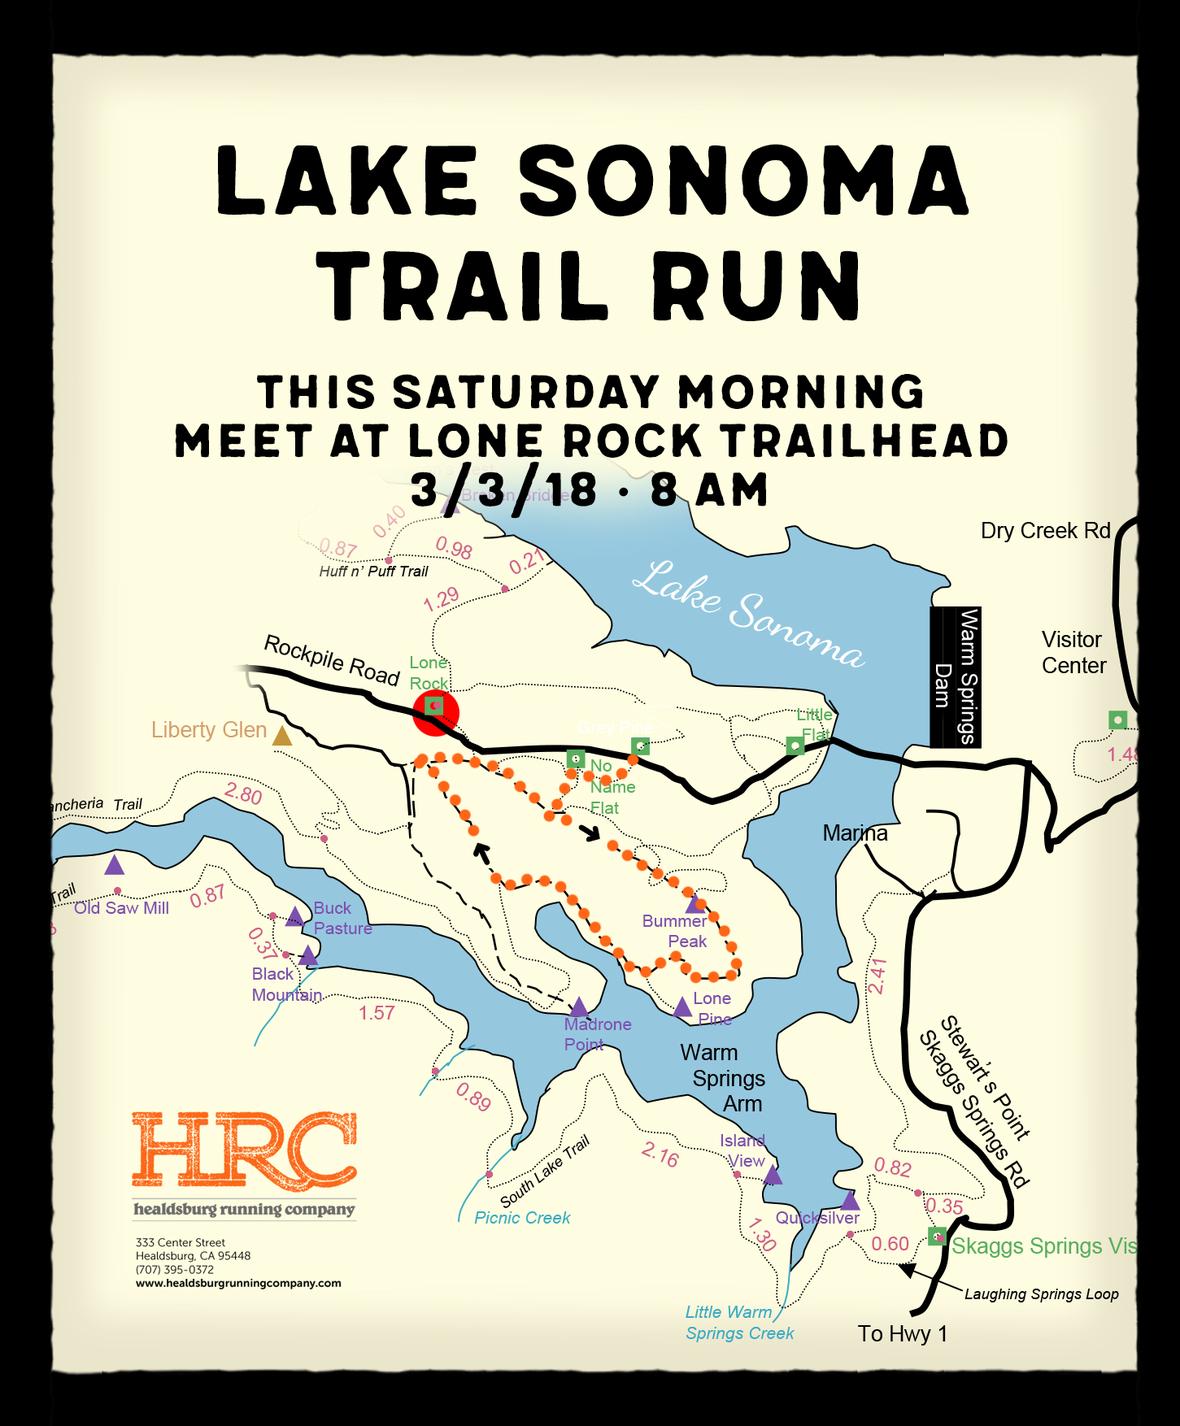 Lake sonoma lone rock newsletter